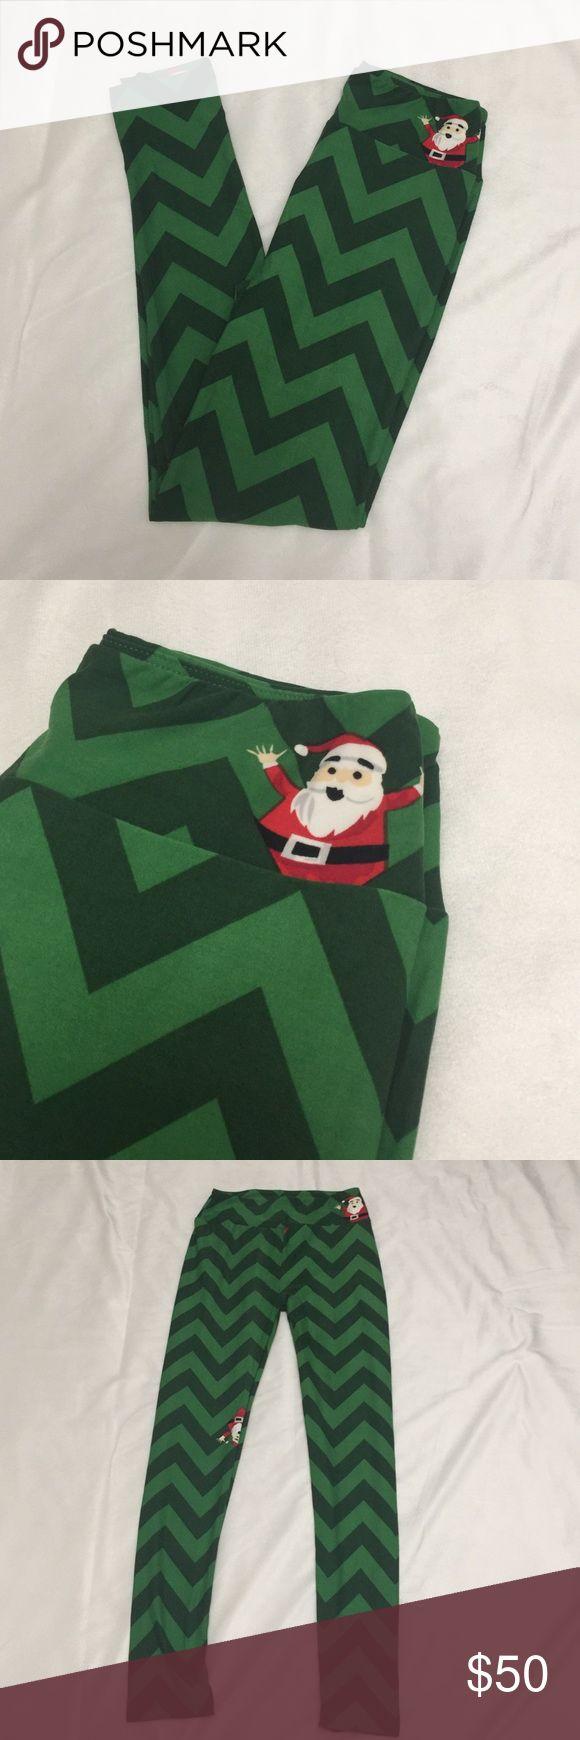 Lularoe Holiday Leggings - os Brand New. Never worn or tried on. Holiday Christmas Santa Green Chevron Leggings. One size. LuLaRoe Pants Leggings